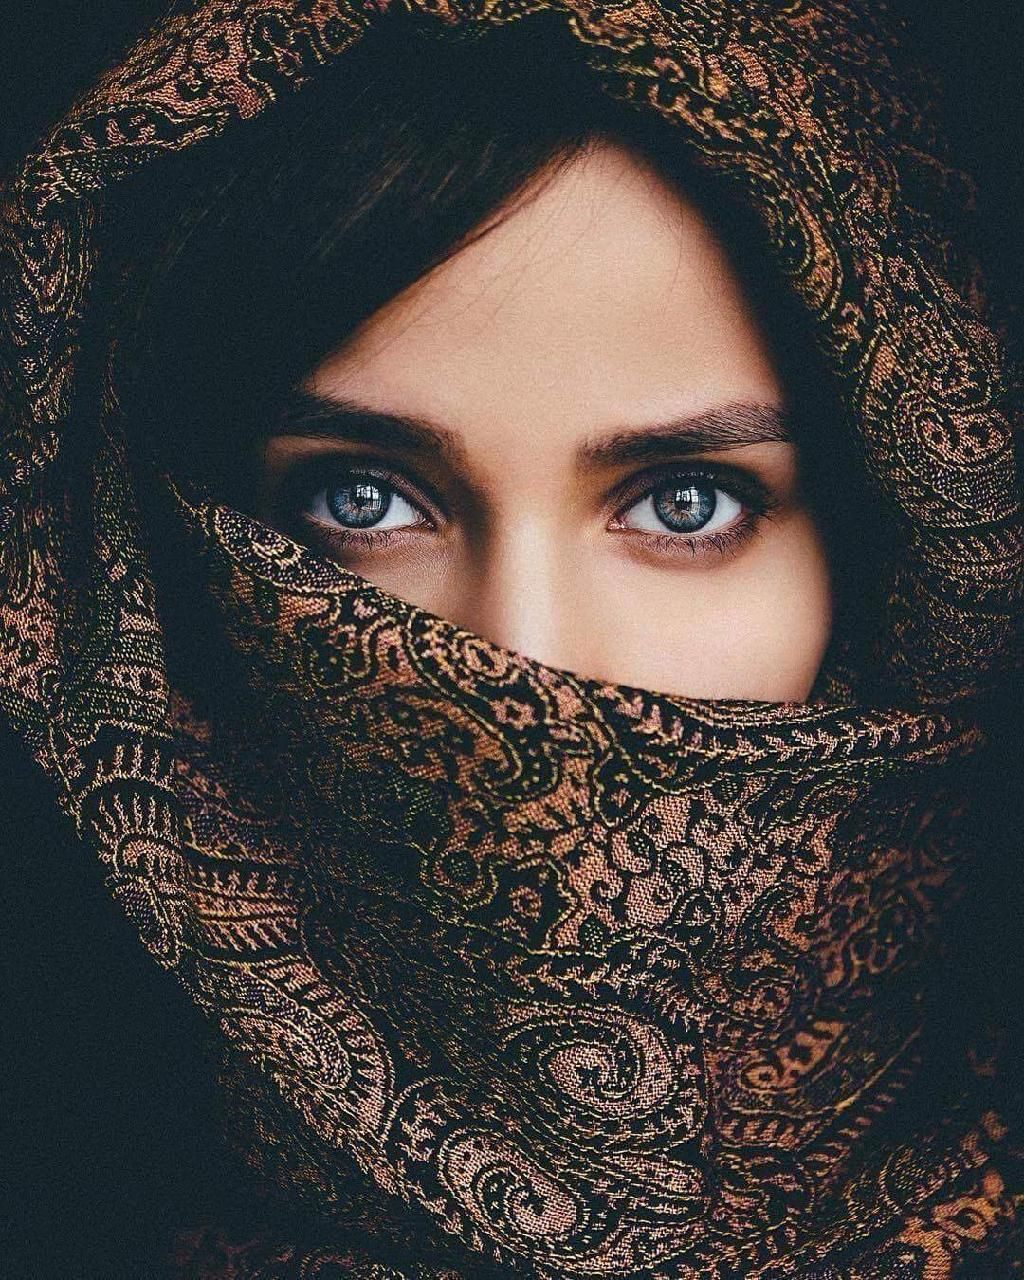 Download Girl Wallpaper By Sefowael 39 Free On Zedge Now Browse Millions Of Popular Eye W Eye Photography Portrait Photography Poses Portrait Photography